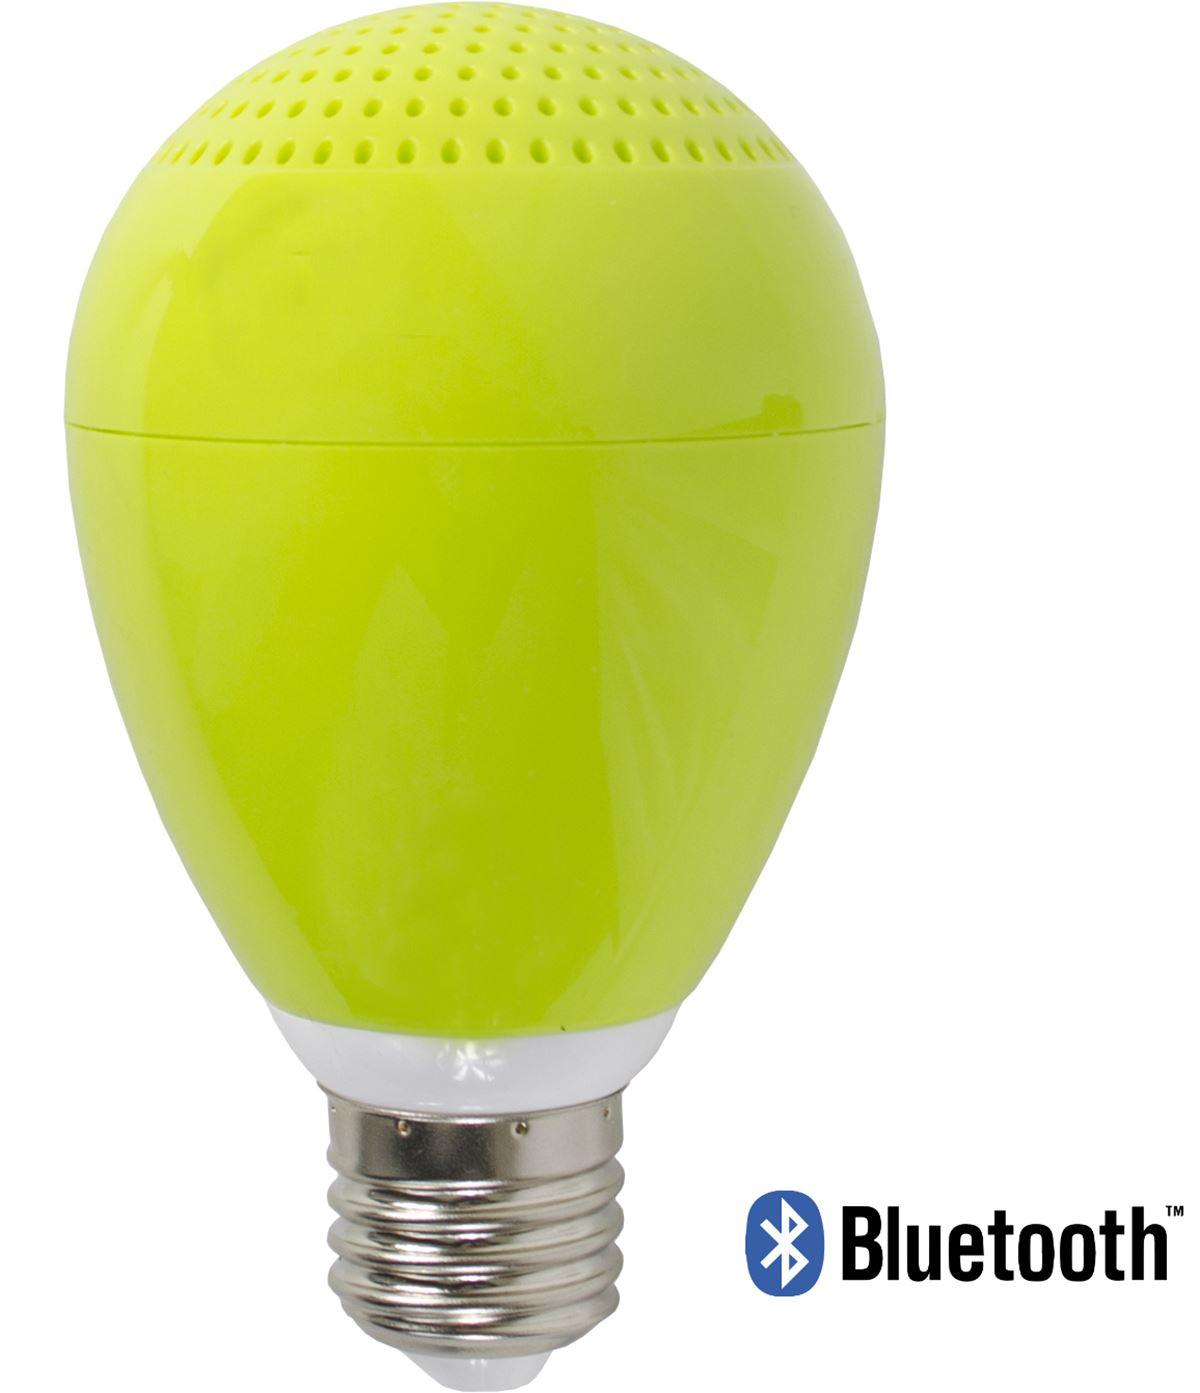 Musical bluetooth light bulbs houseboat magazine for Bluetooth bulb